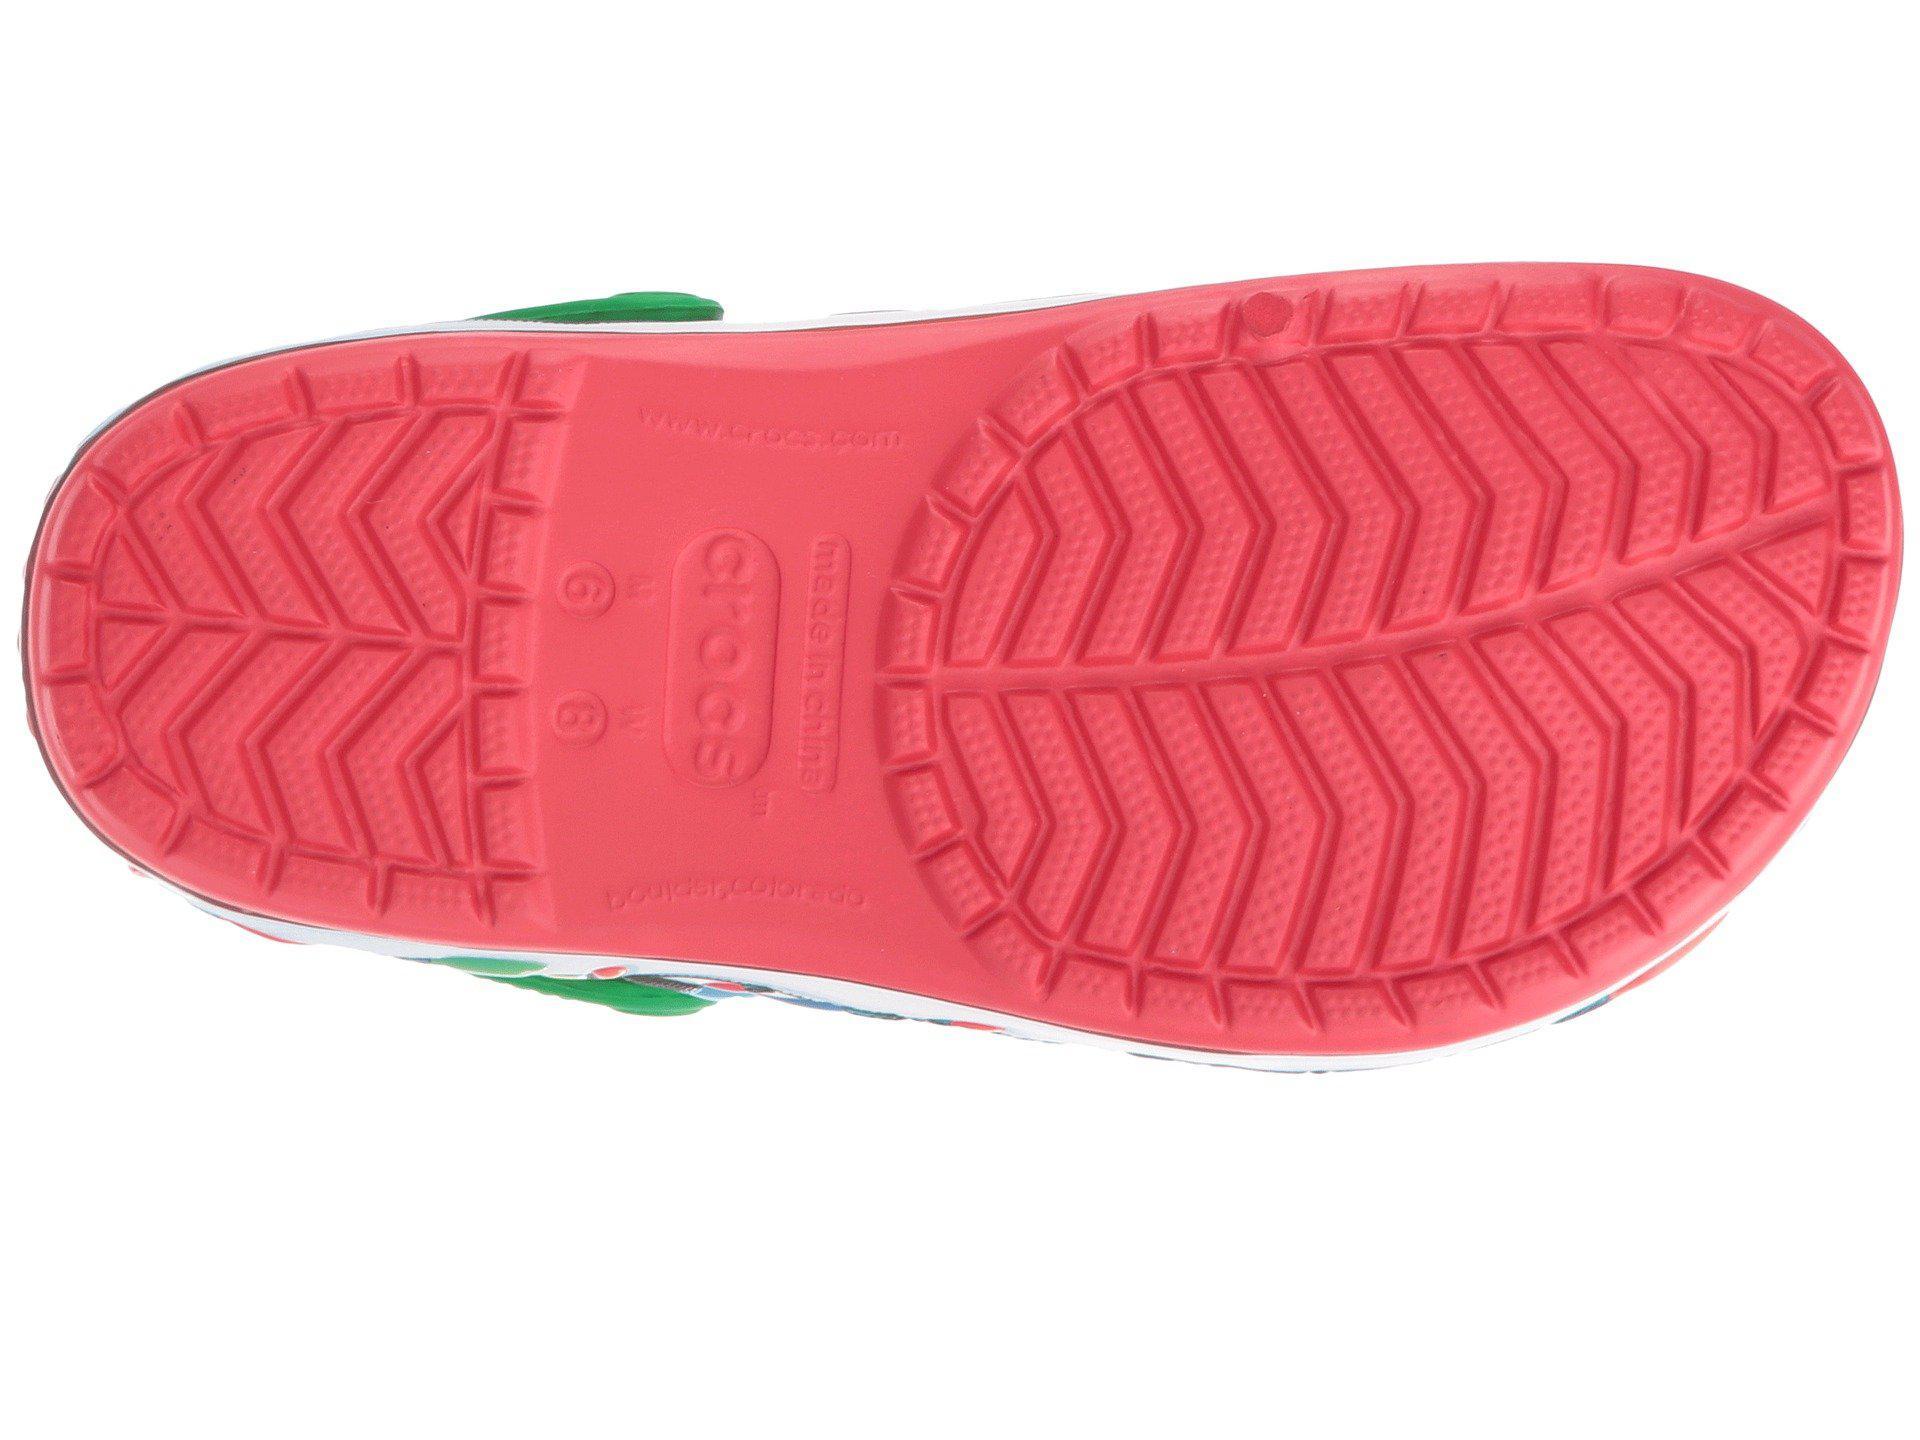 4fcc21b09dc06 Lyst - Crocs™ Crocband Holiday Lights Clog